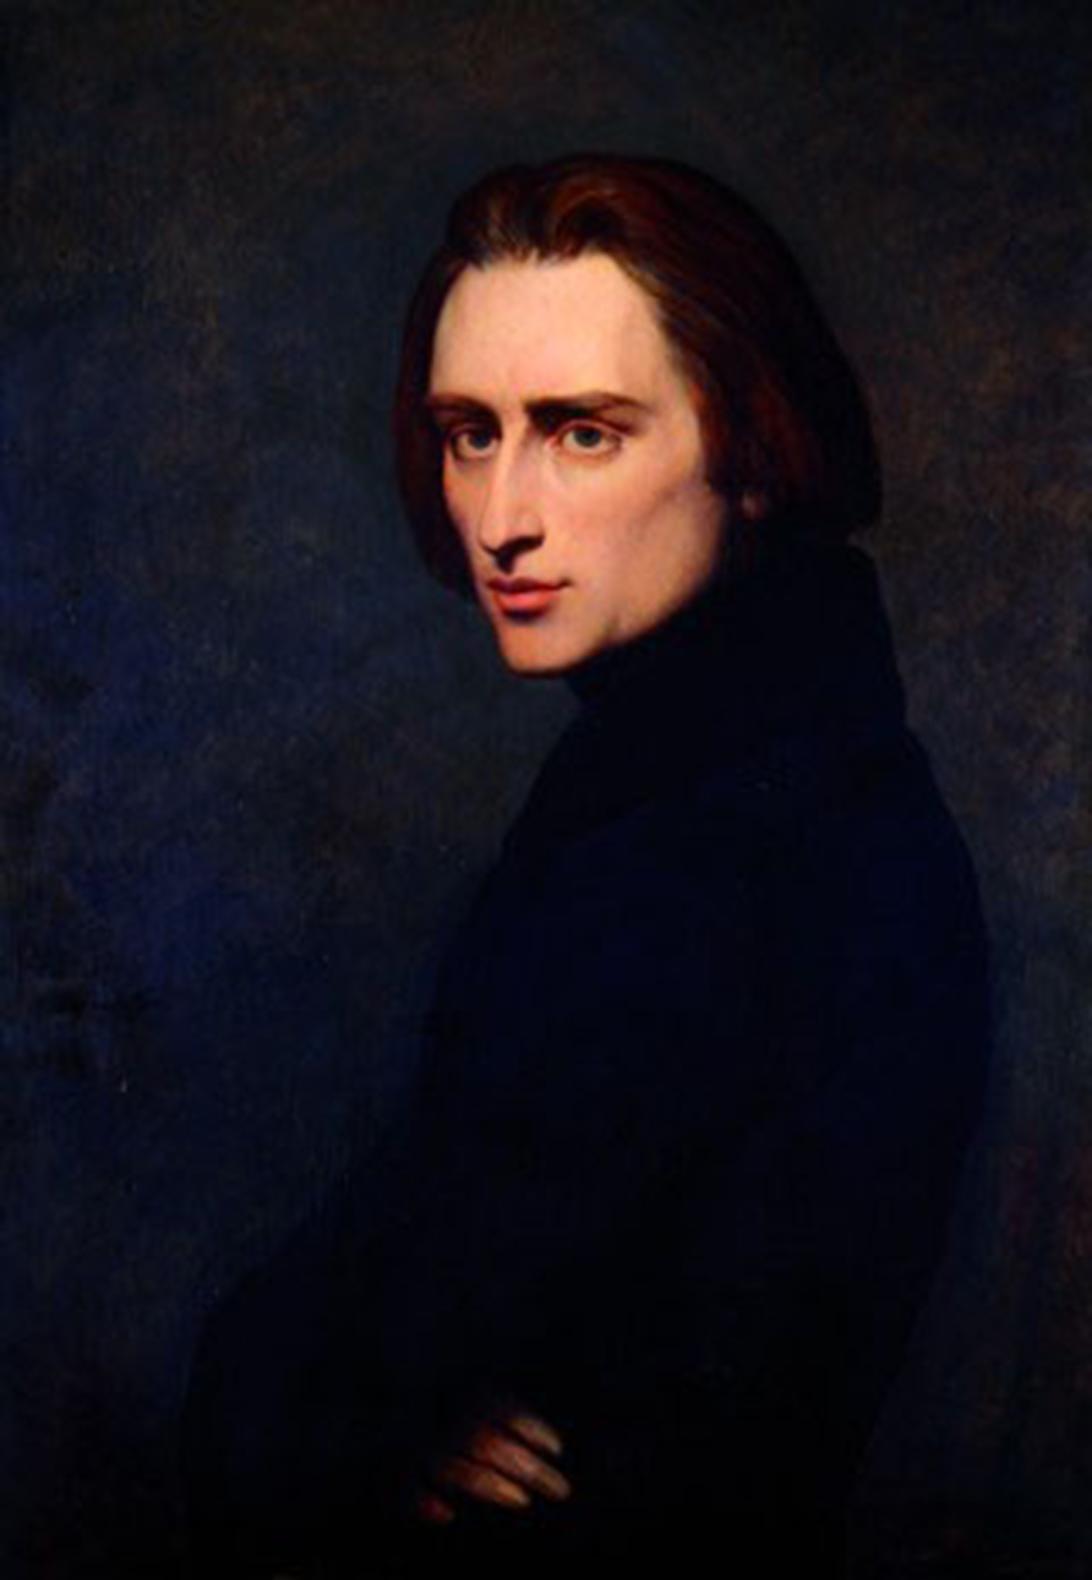 File:Ary Scheffer - Franz Liszt.jpg